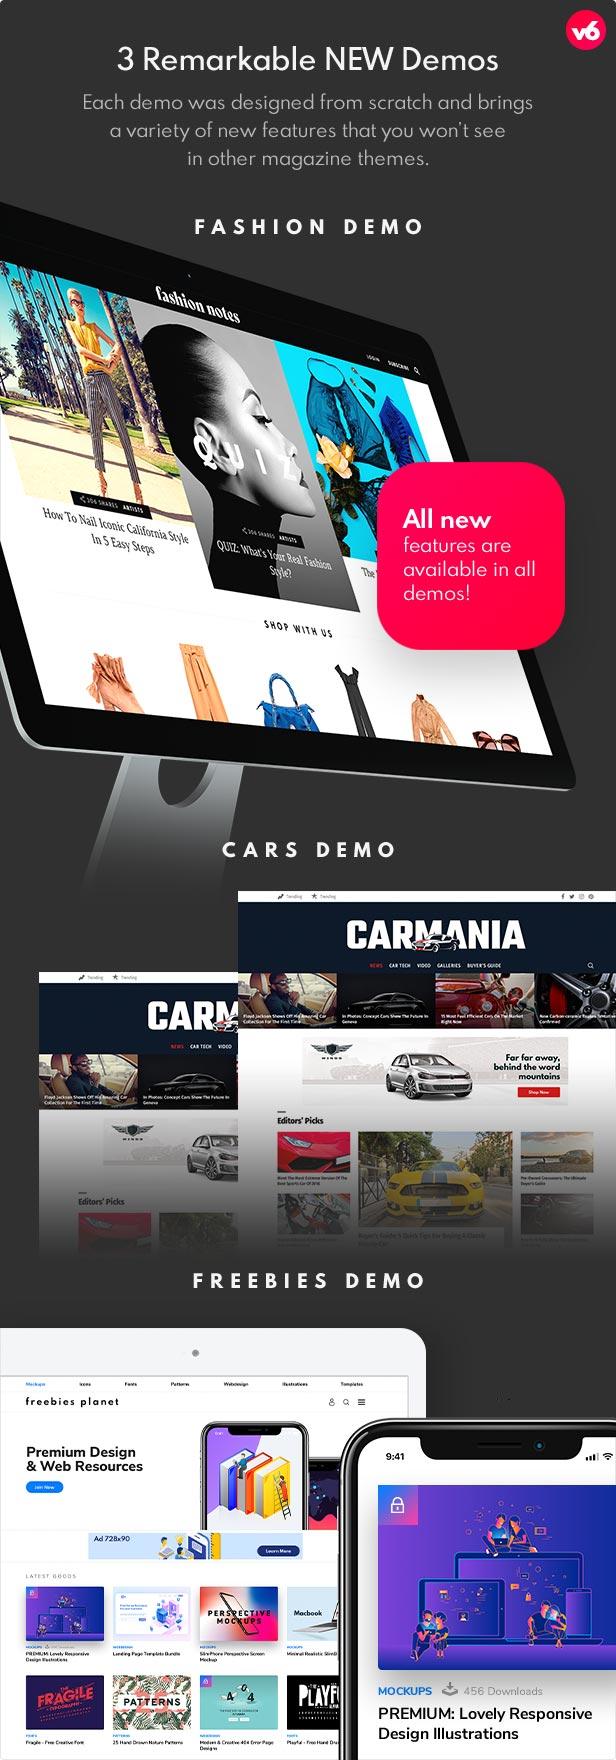 6 demos - Bimber - Viral Magazine WordPress Theme